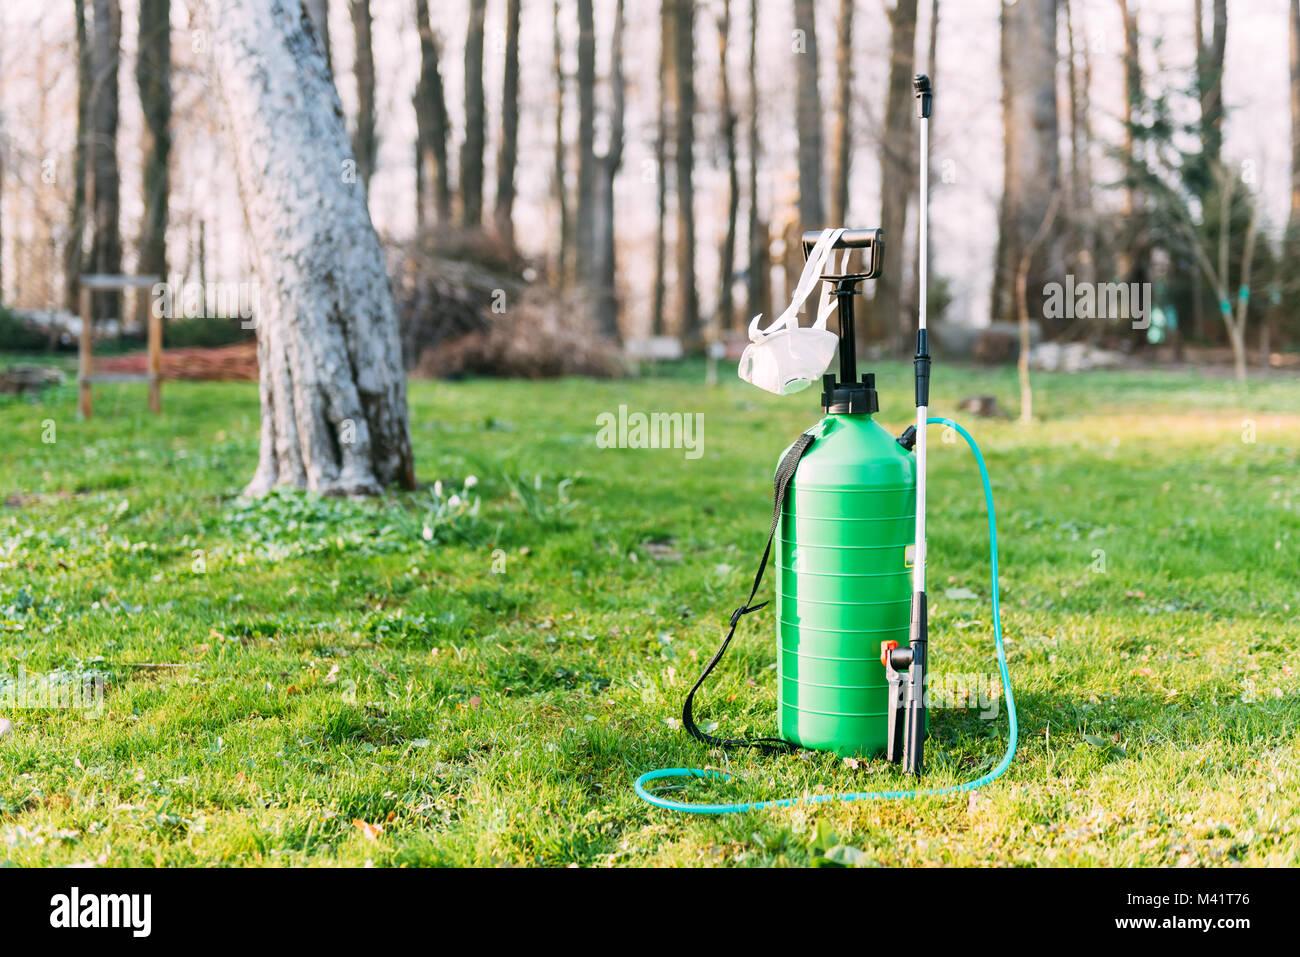 Green sprayer on spring garden - Stock Image